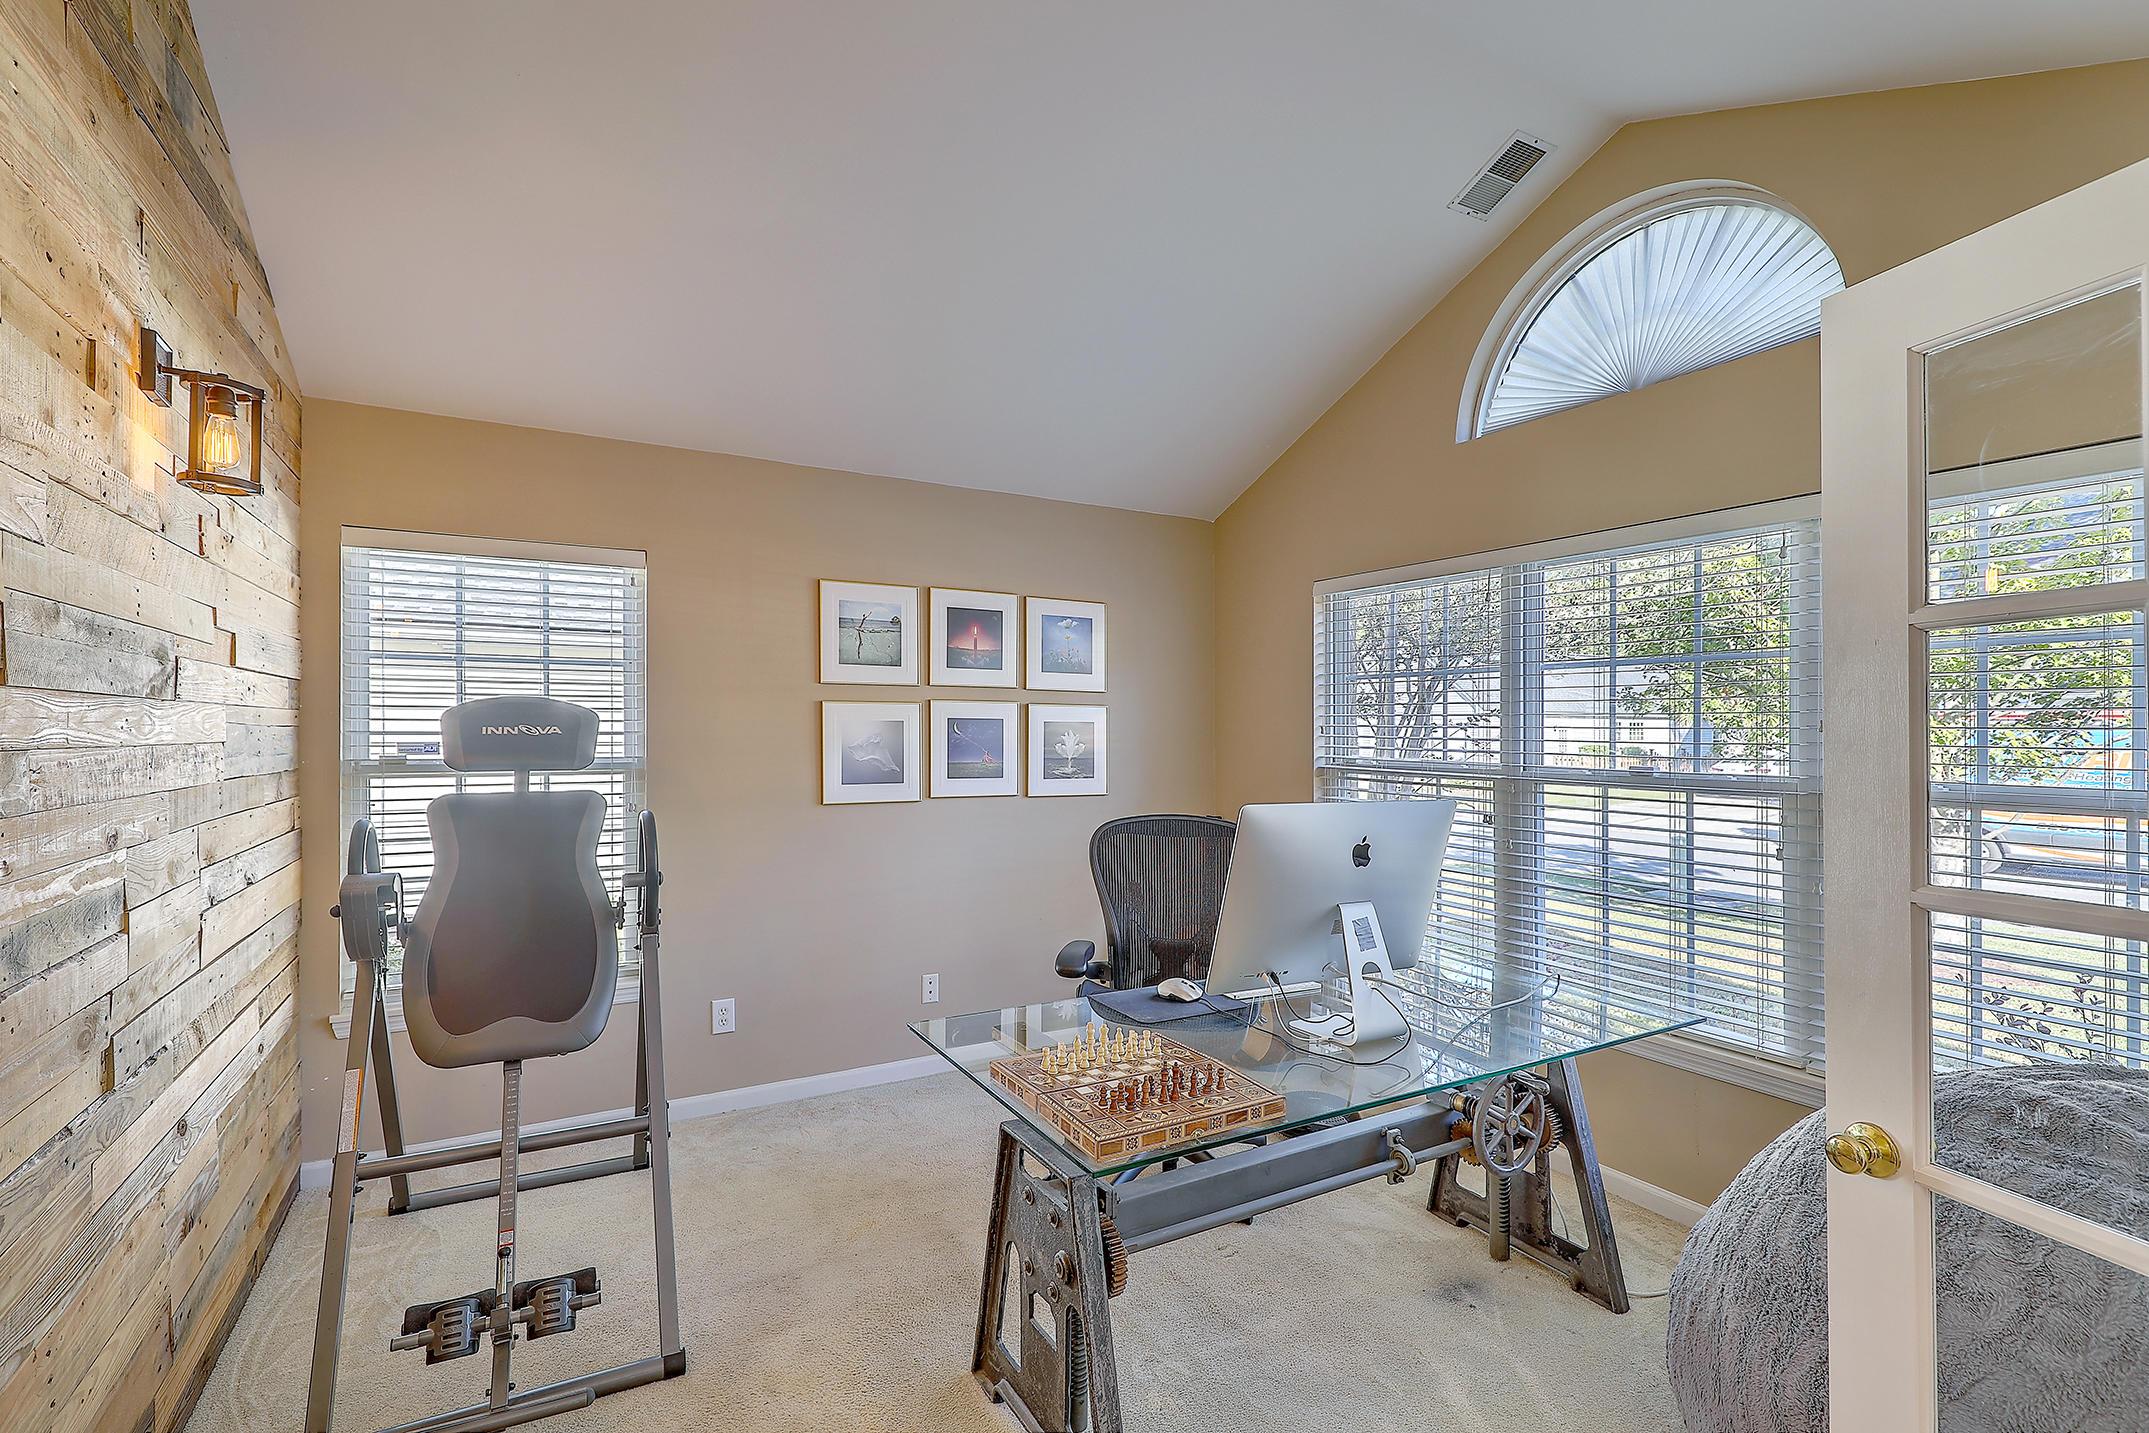 Dunes West Homes For Sale - 1471 Cypress Pointe, Mount Pleasant, SC - 7